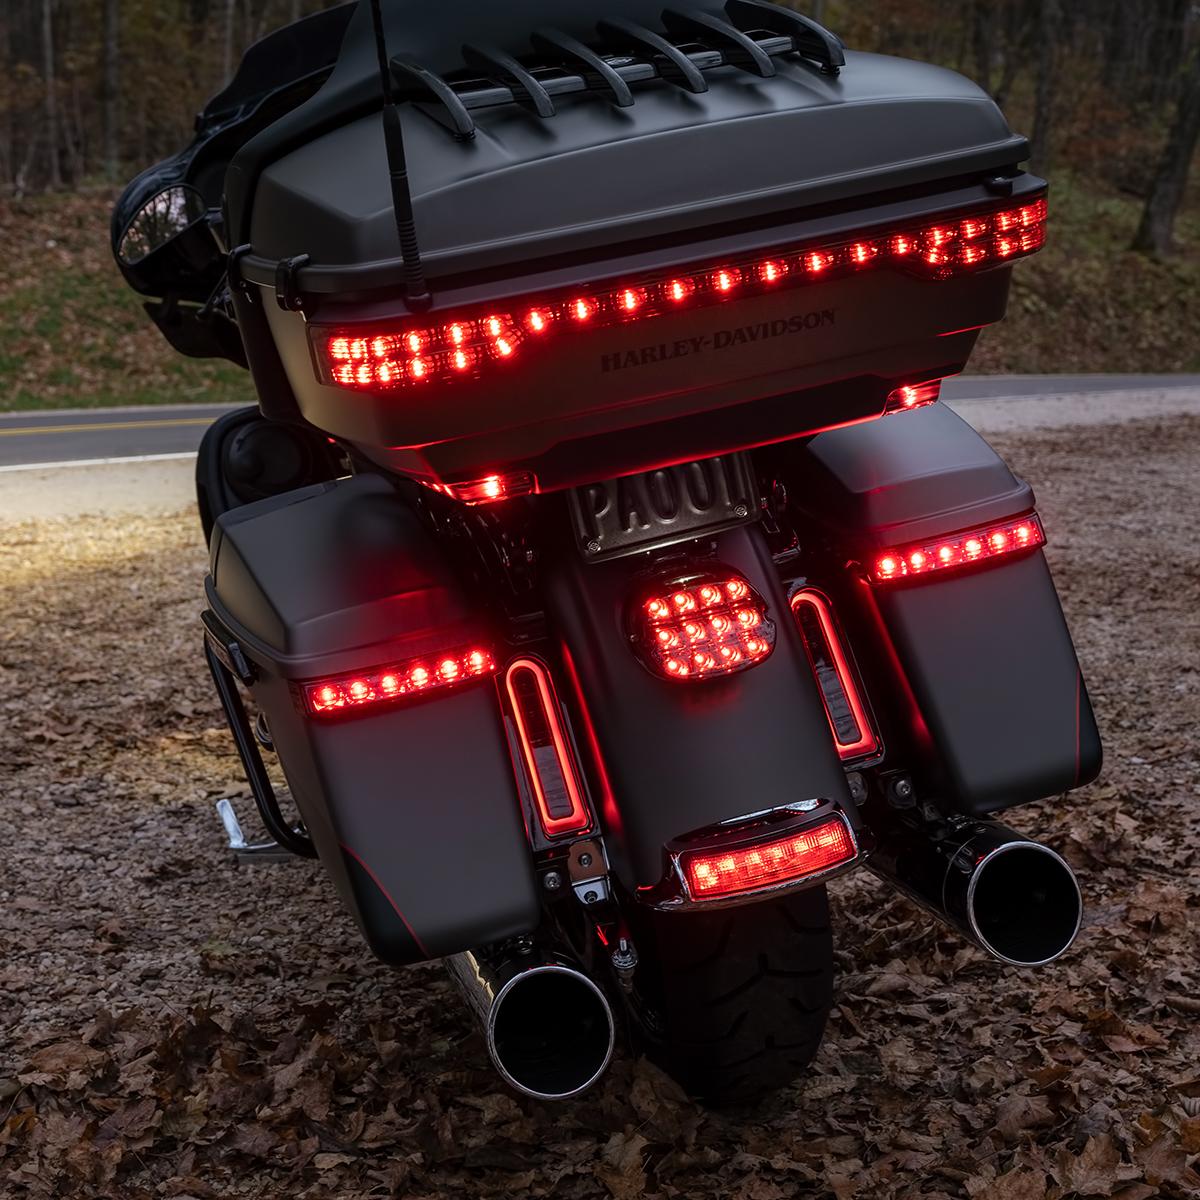 2019 Ultra Limited Motorcycle | Harley-Davidson USA